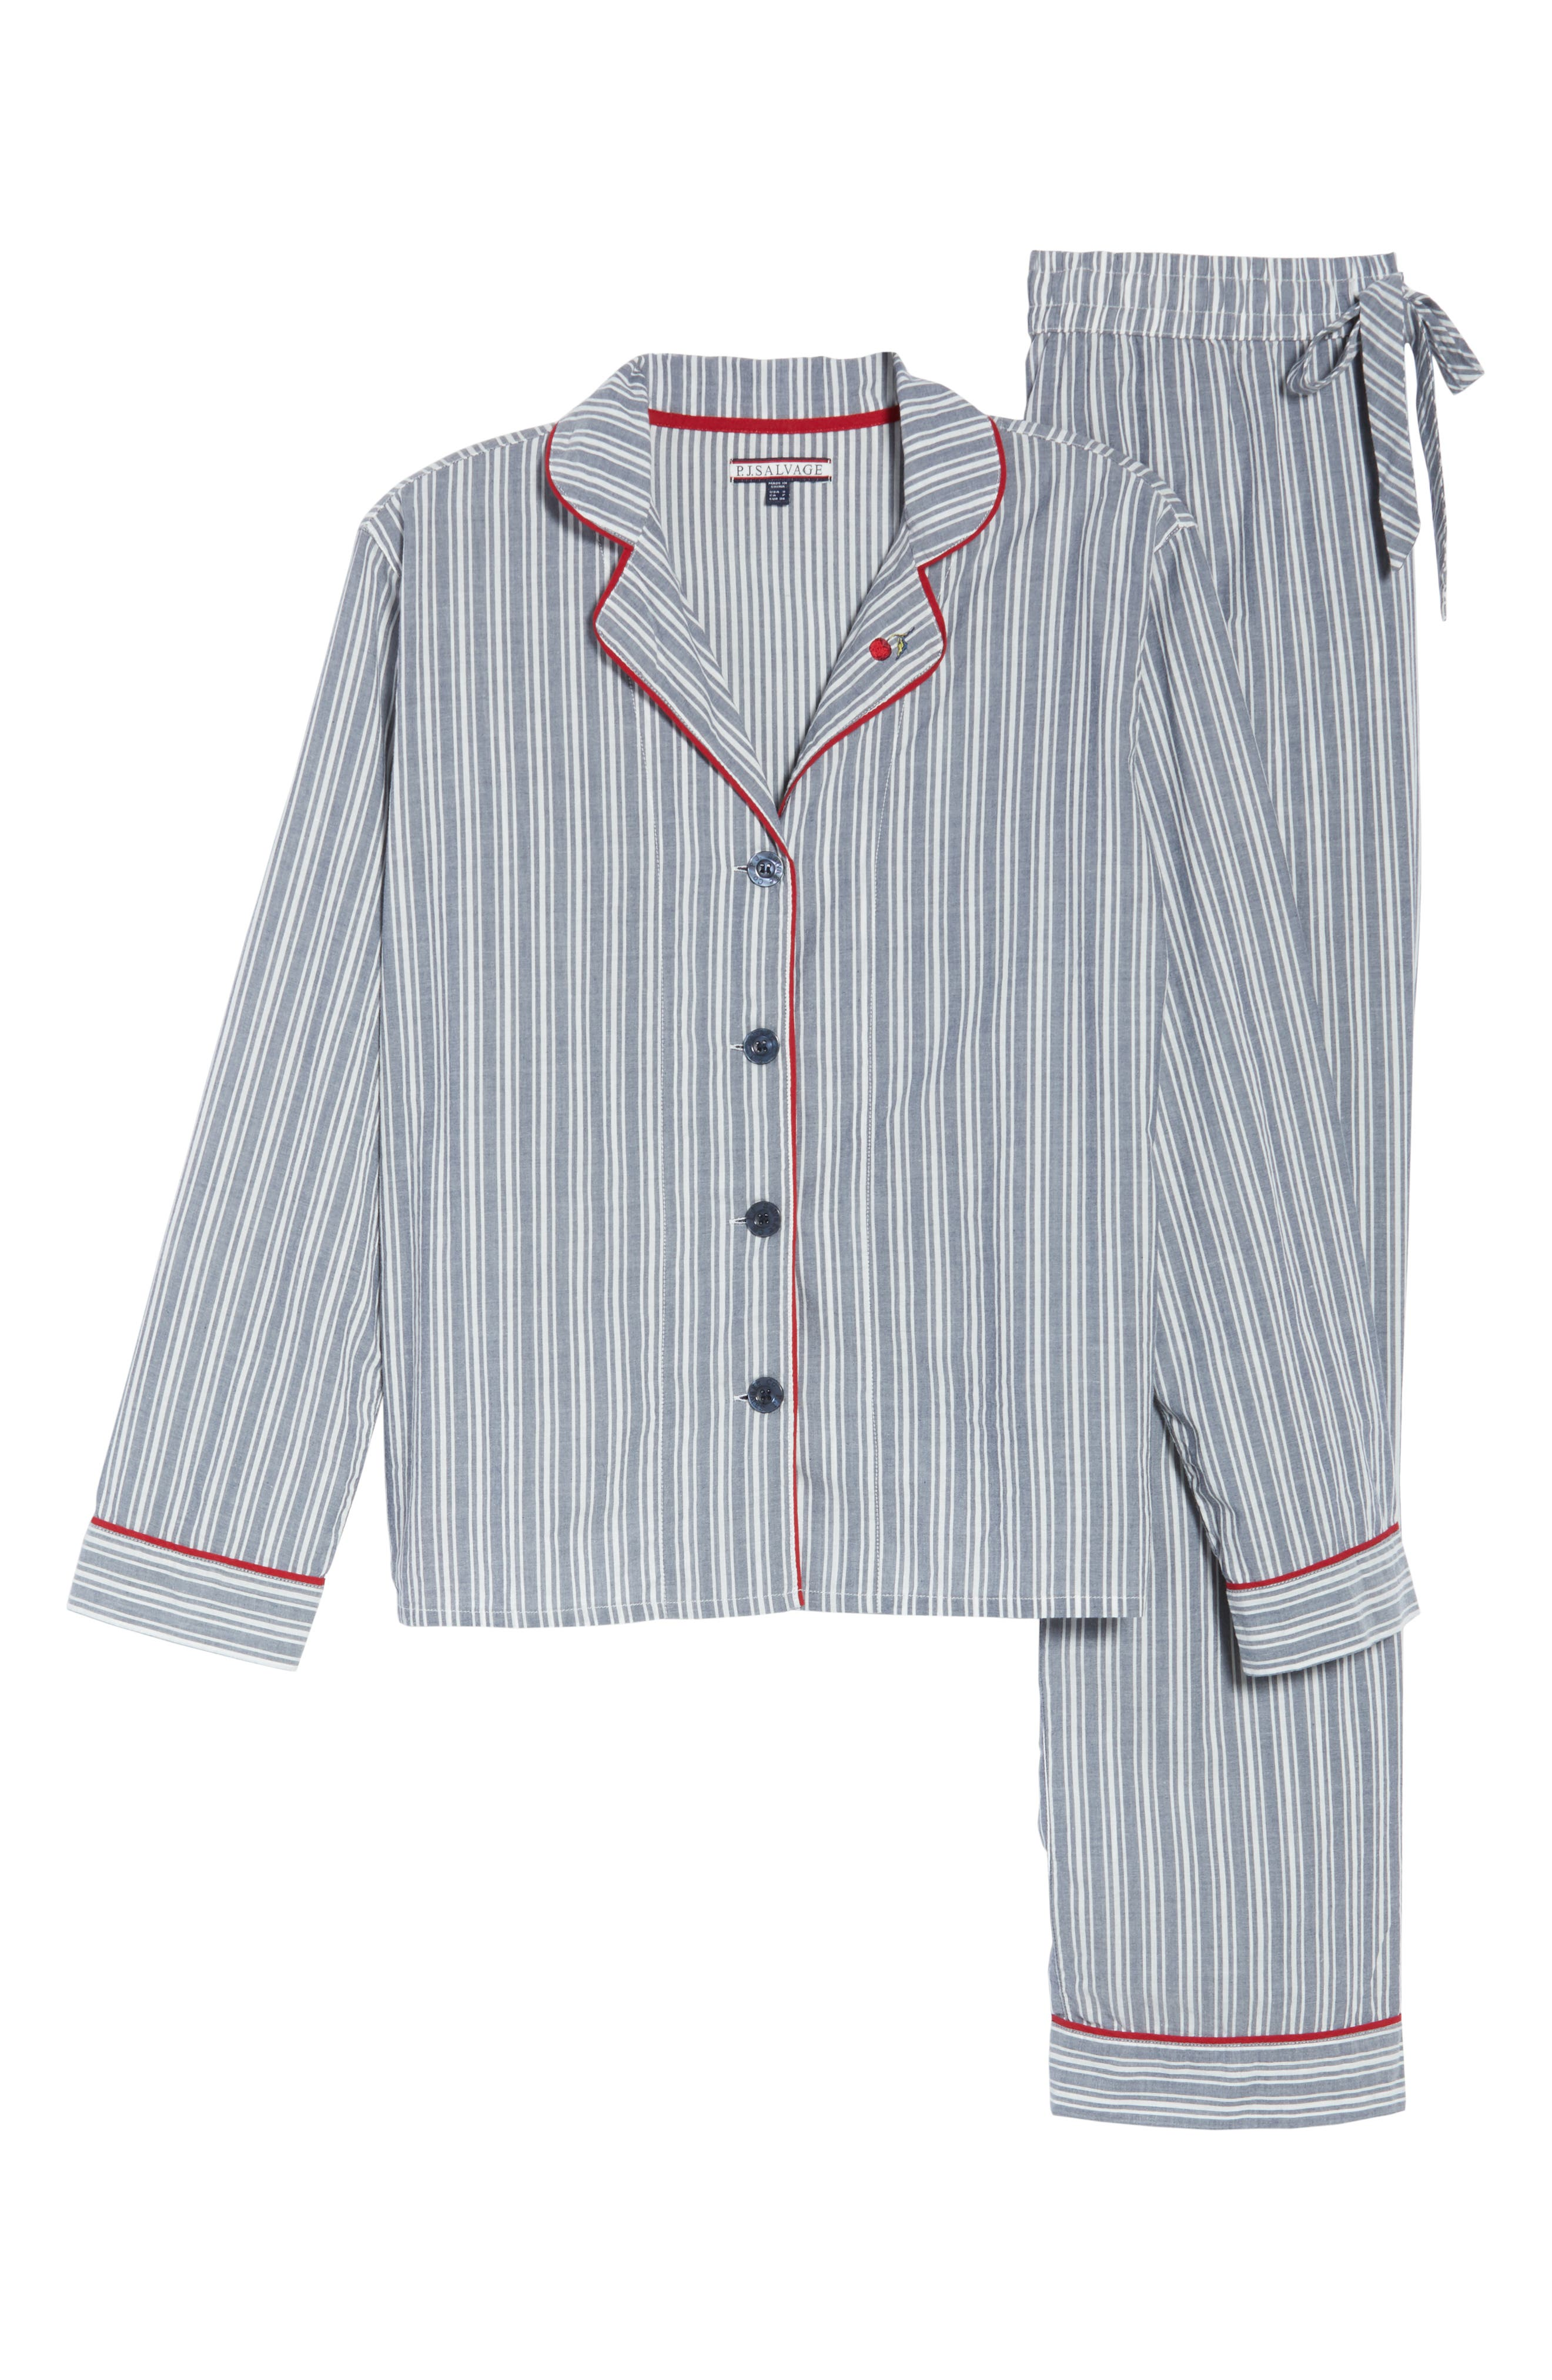 PJ SALVAGE, Mon Cheri Pajamas, Alternate thumbnail 6, color, DENIM